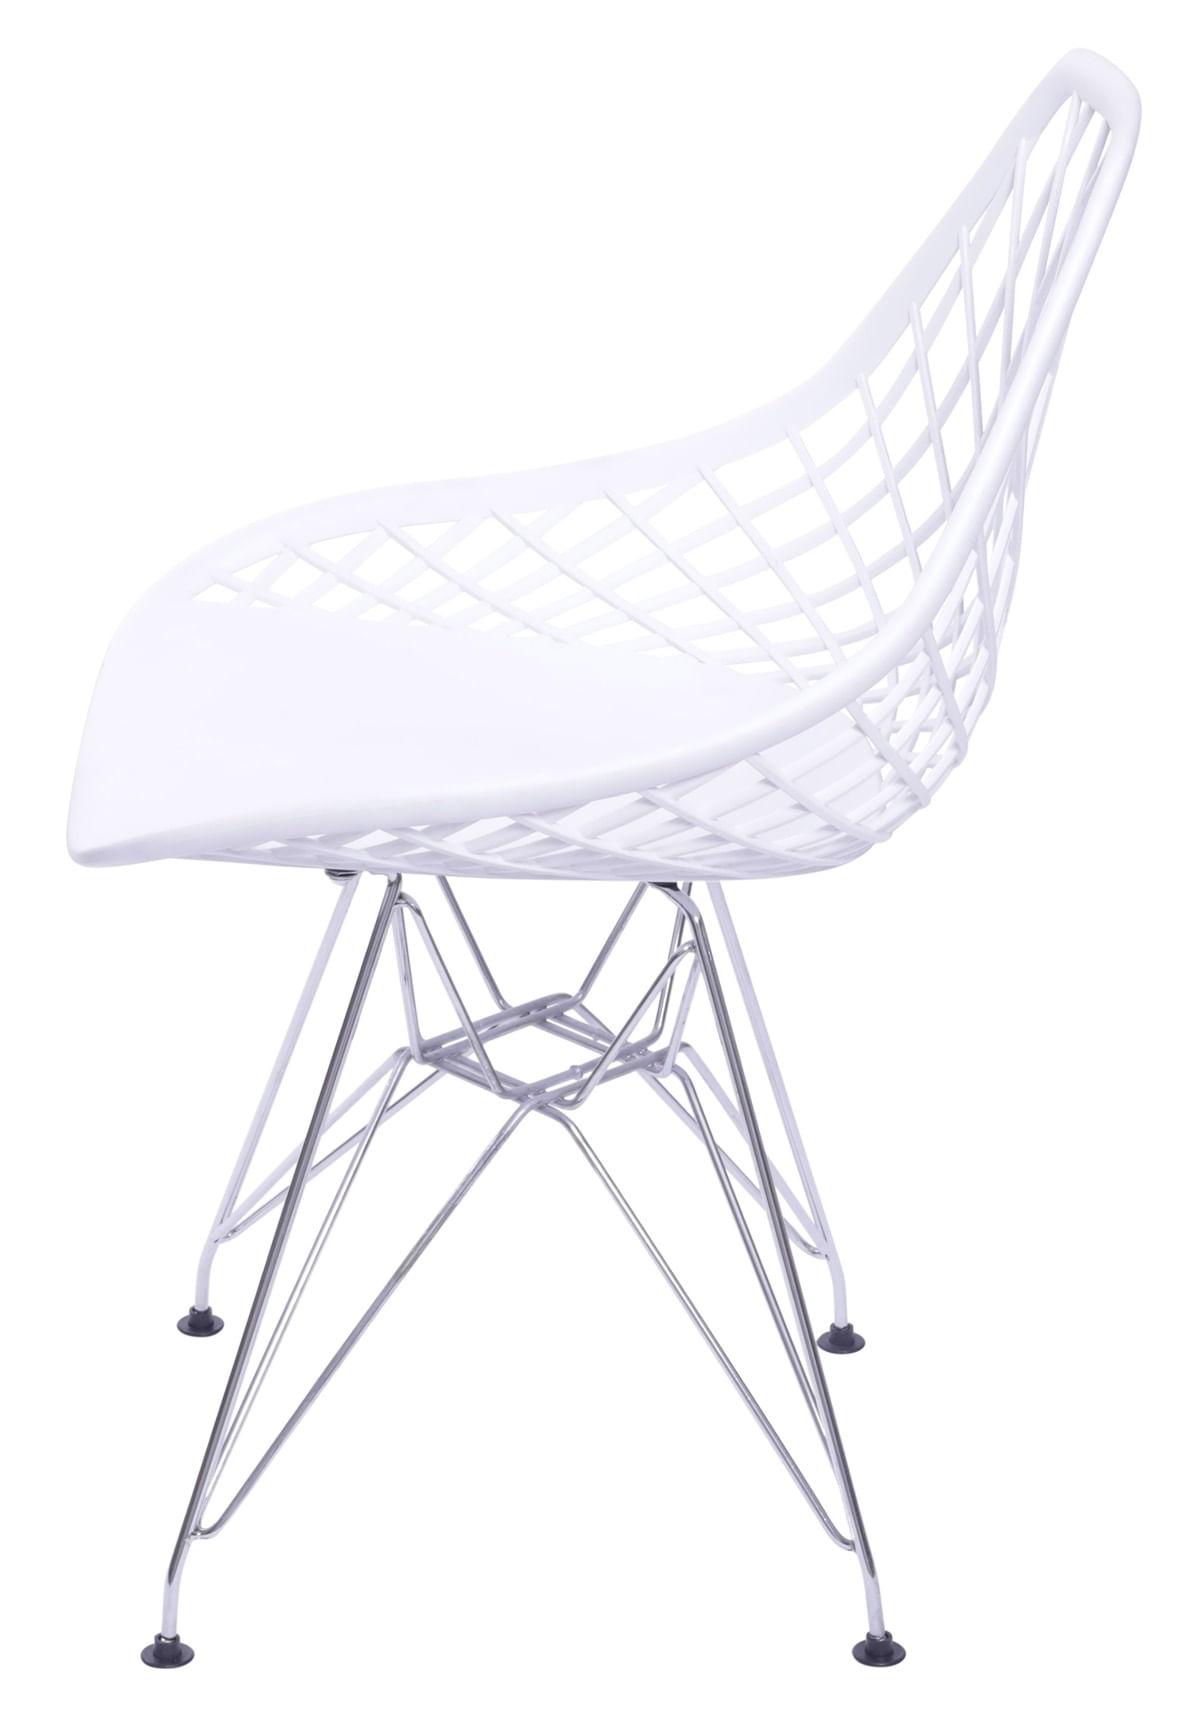 Cadeira Boom Polipropileno Branco com Base Cromada - 55933